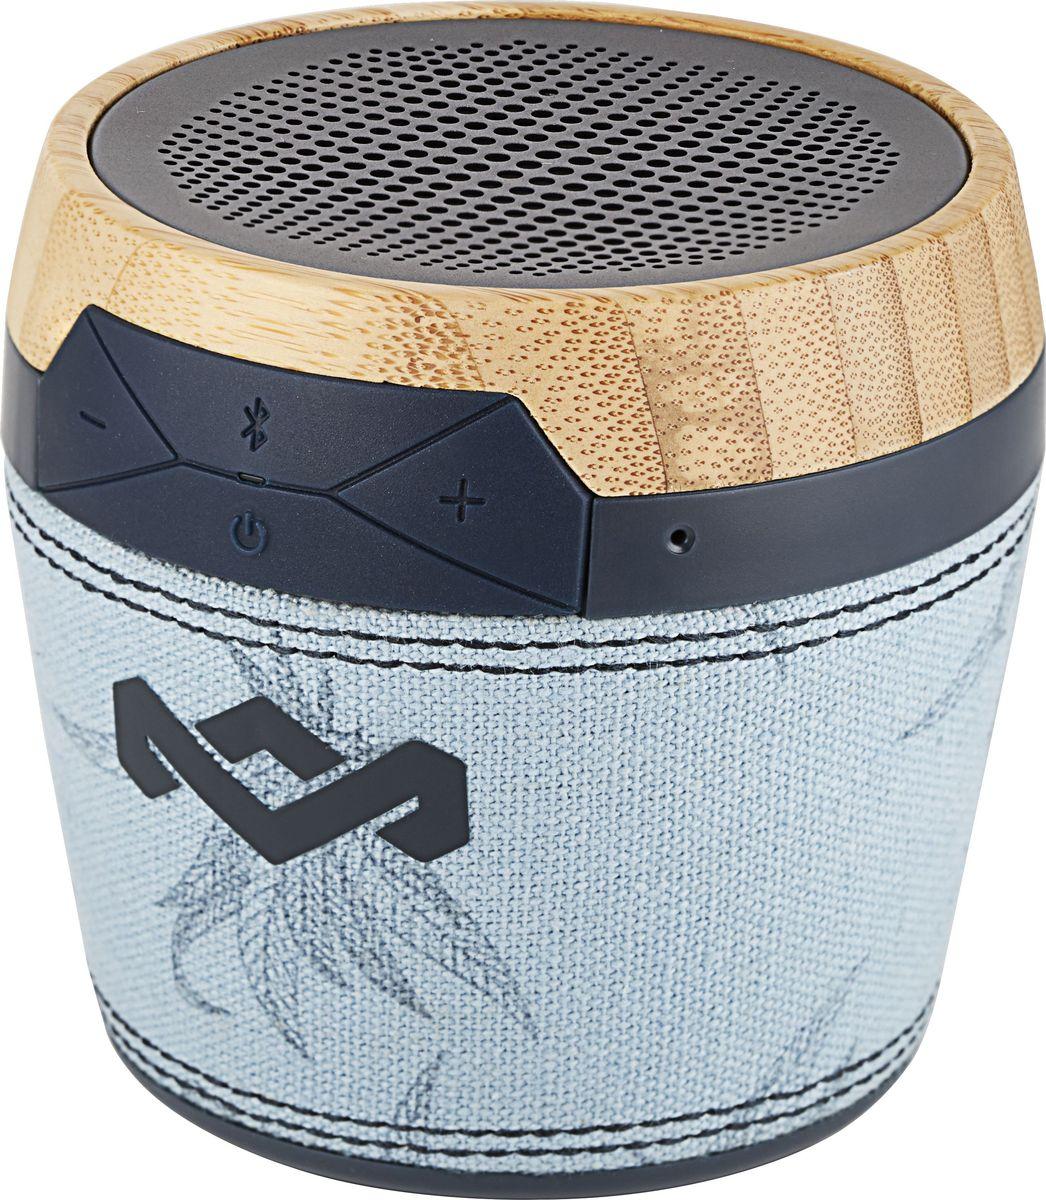 House of Marley Chant Mini, Blue Hemp портативная акустическая система - Портативная акустика